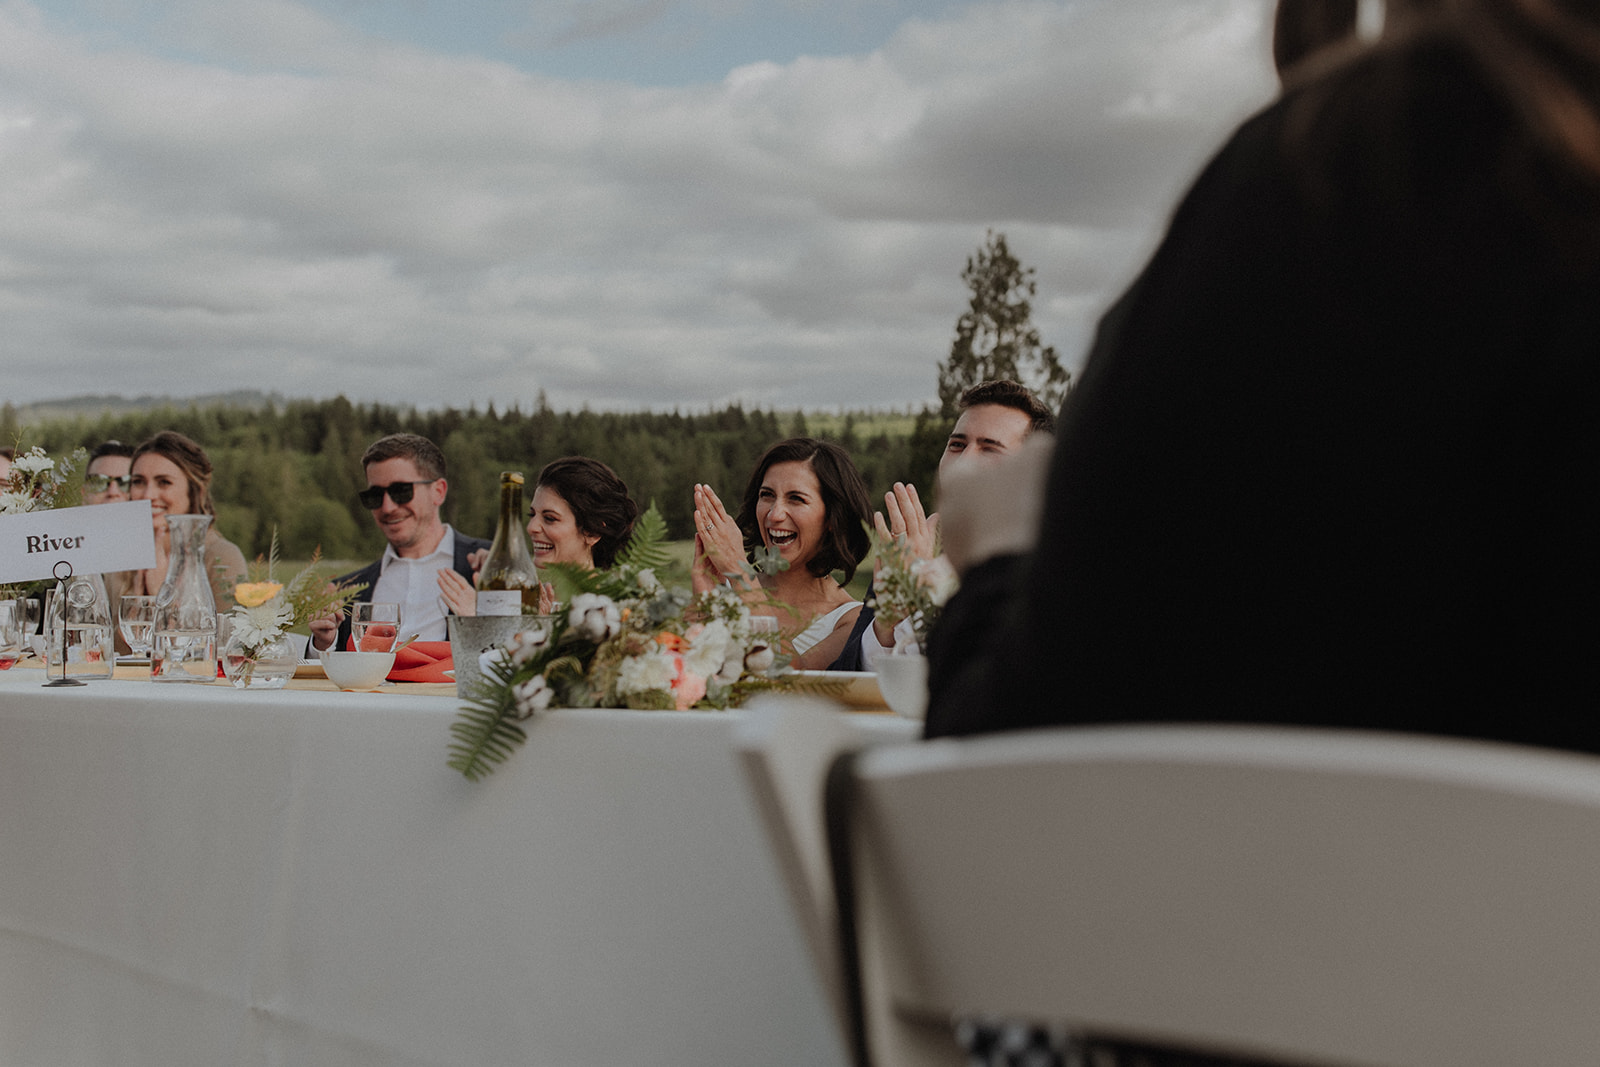 cortney_skye_wedding_june2019-565.jpg